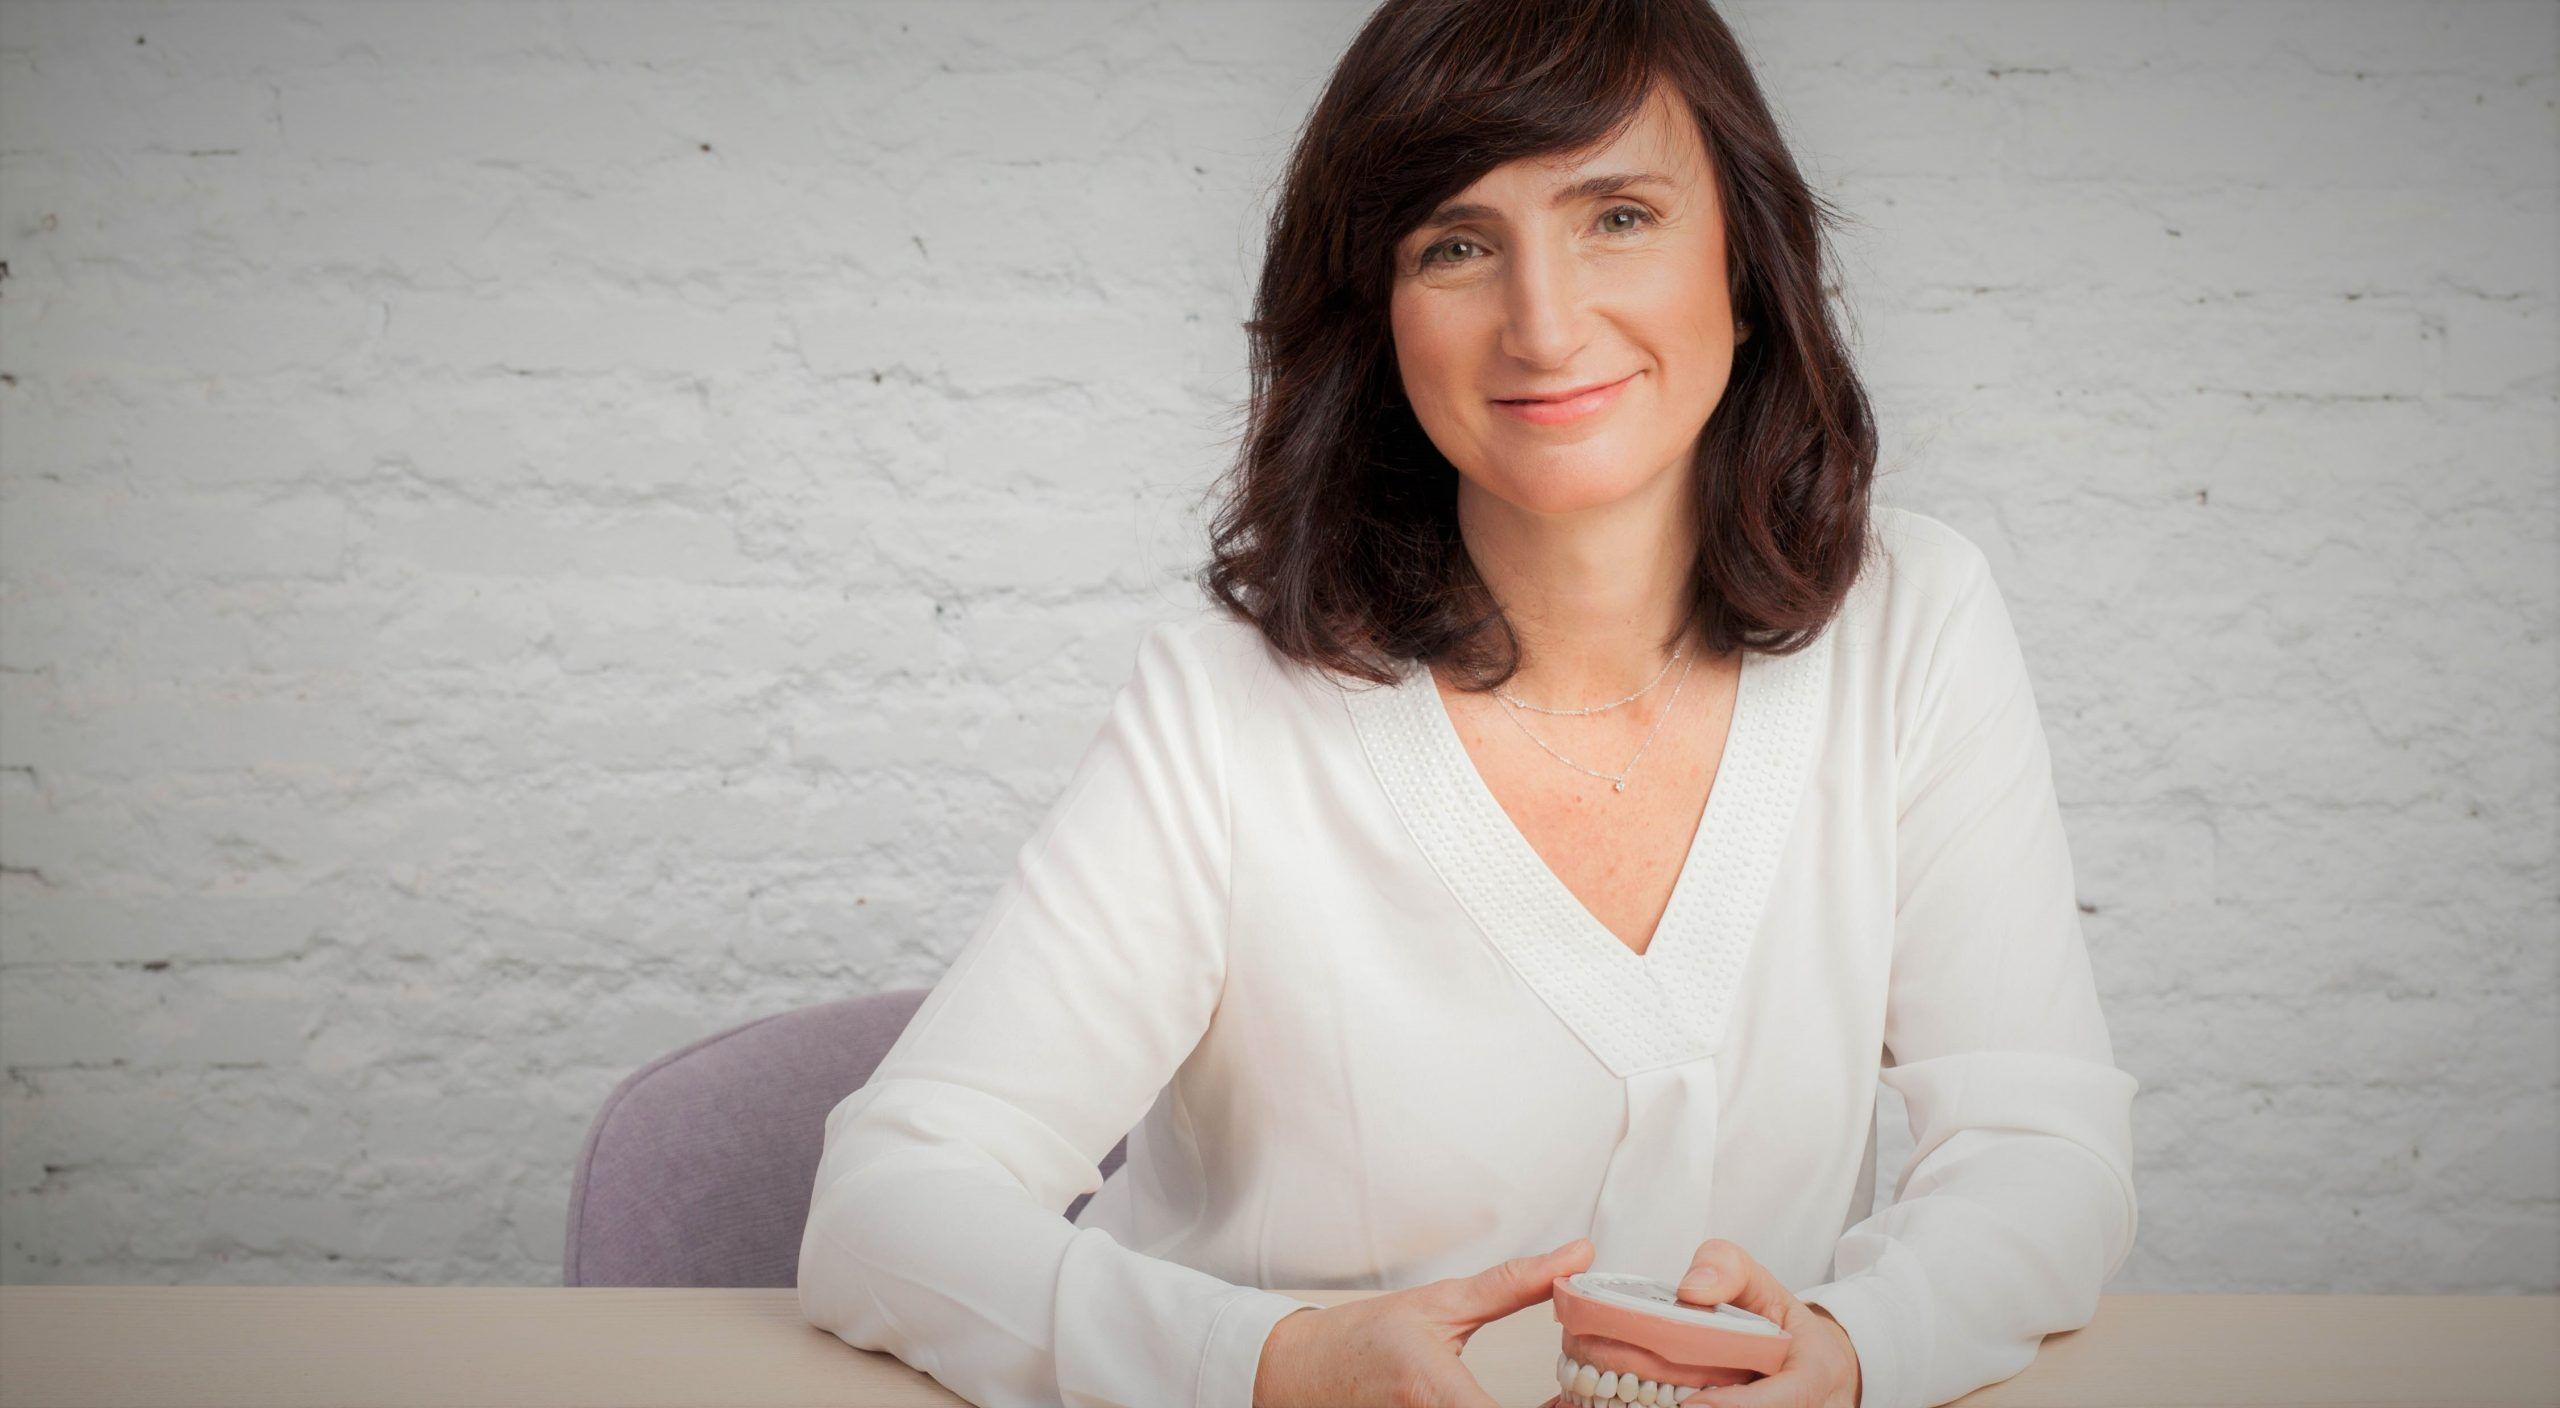 Cristina Estrada - traductora autónoma especializada en el campo dental e higienista